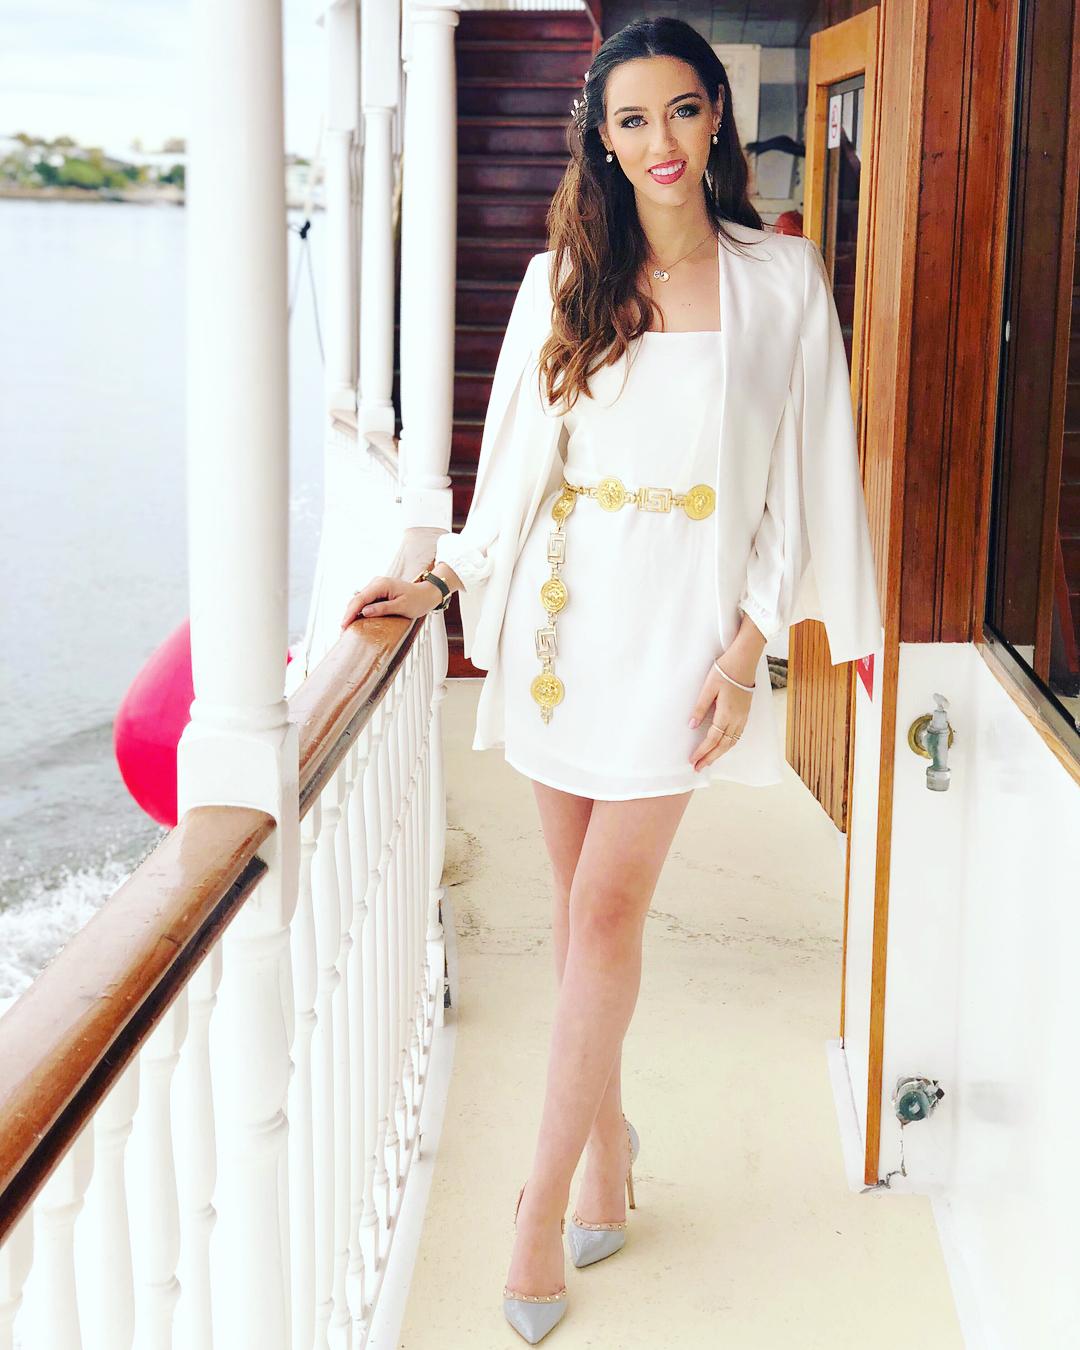 candidatas a miss world australia 2018. final: 31 agosto. - Página 4 Ekulhui6